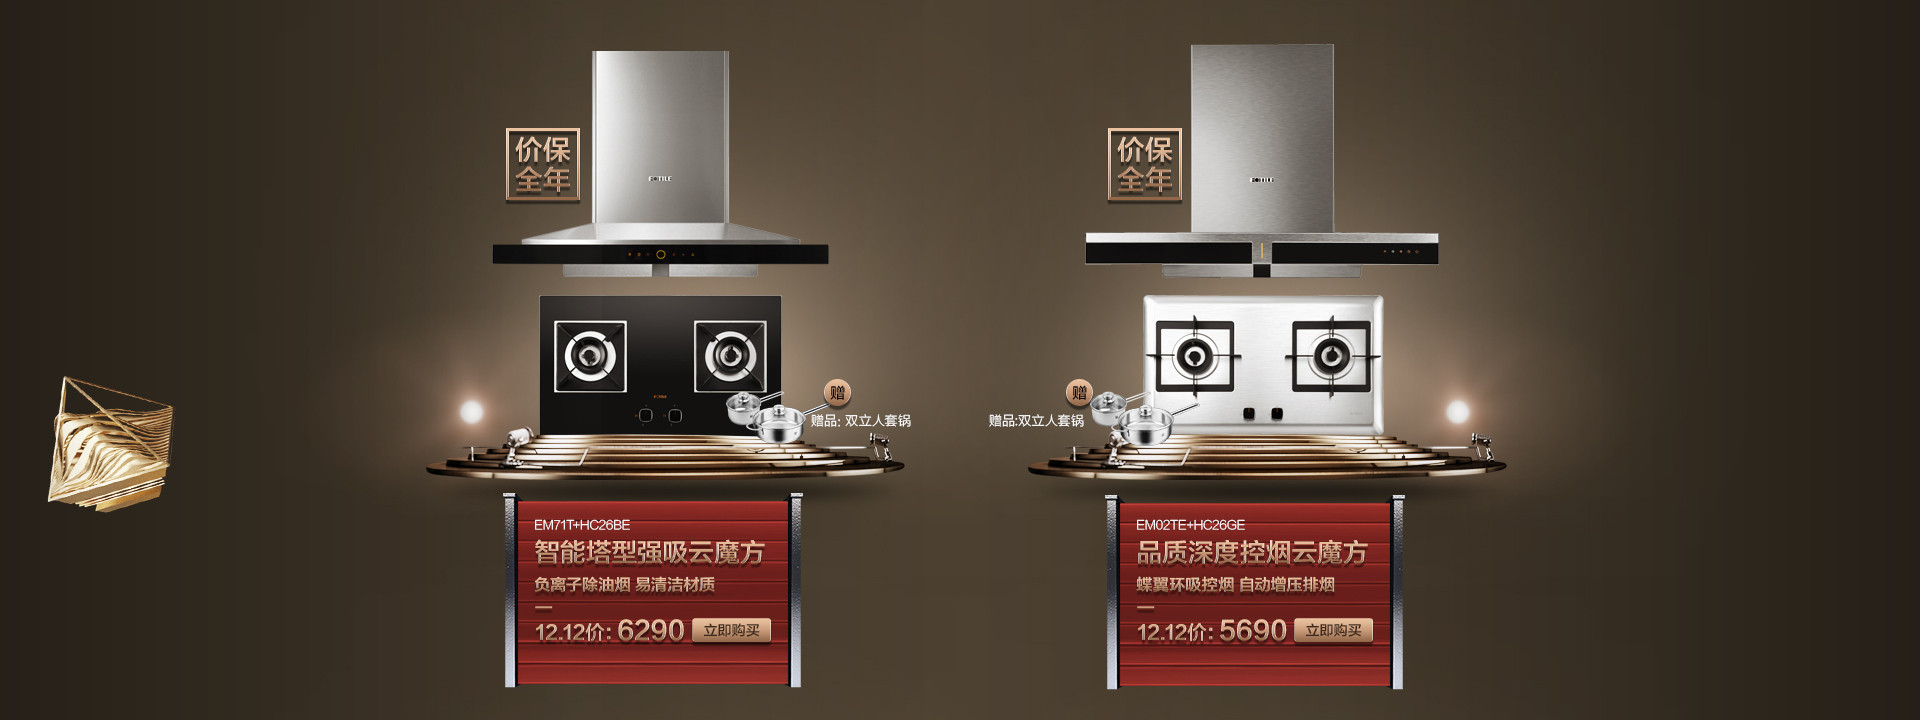 http://image.suning.cn/uimg/sop/commodity/859942211662101877480000_x.jpg